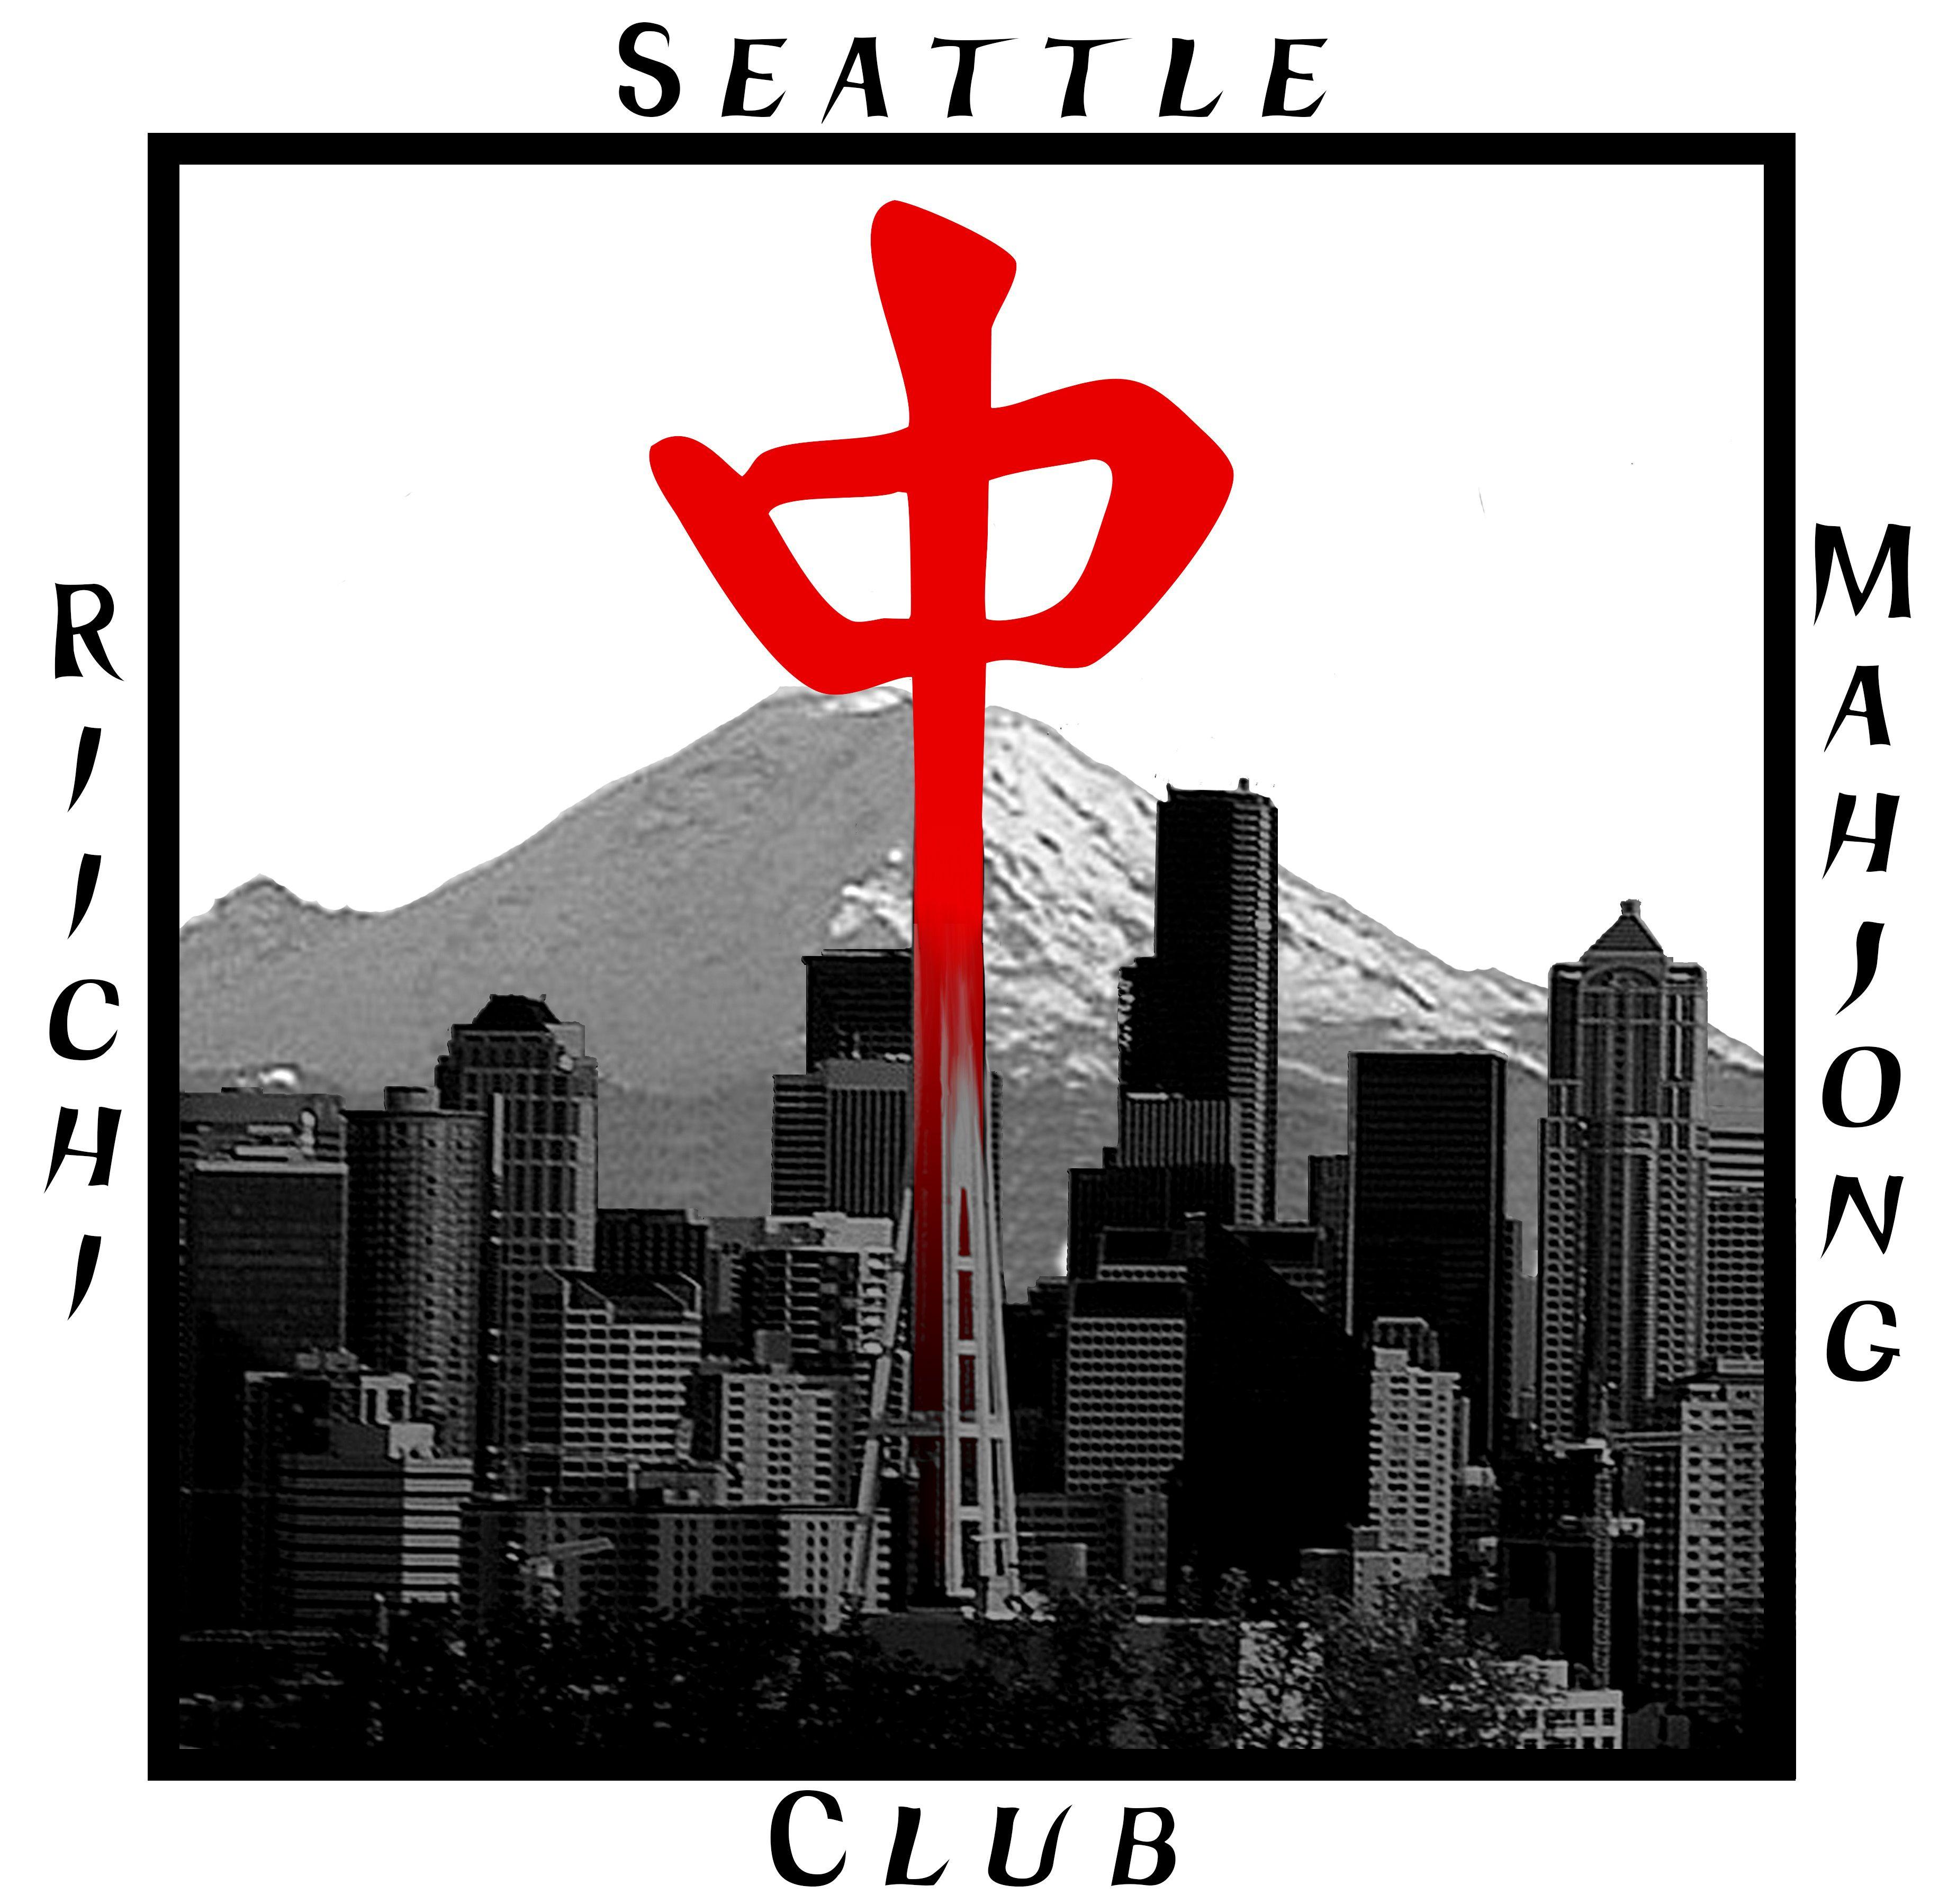 Seattle Riichi Mahjong Club